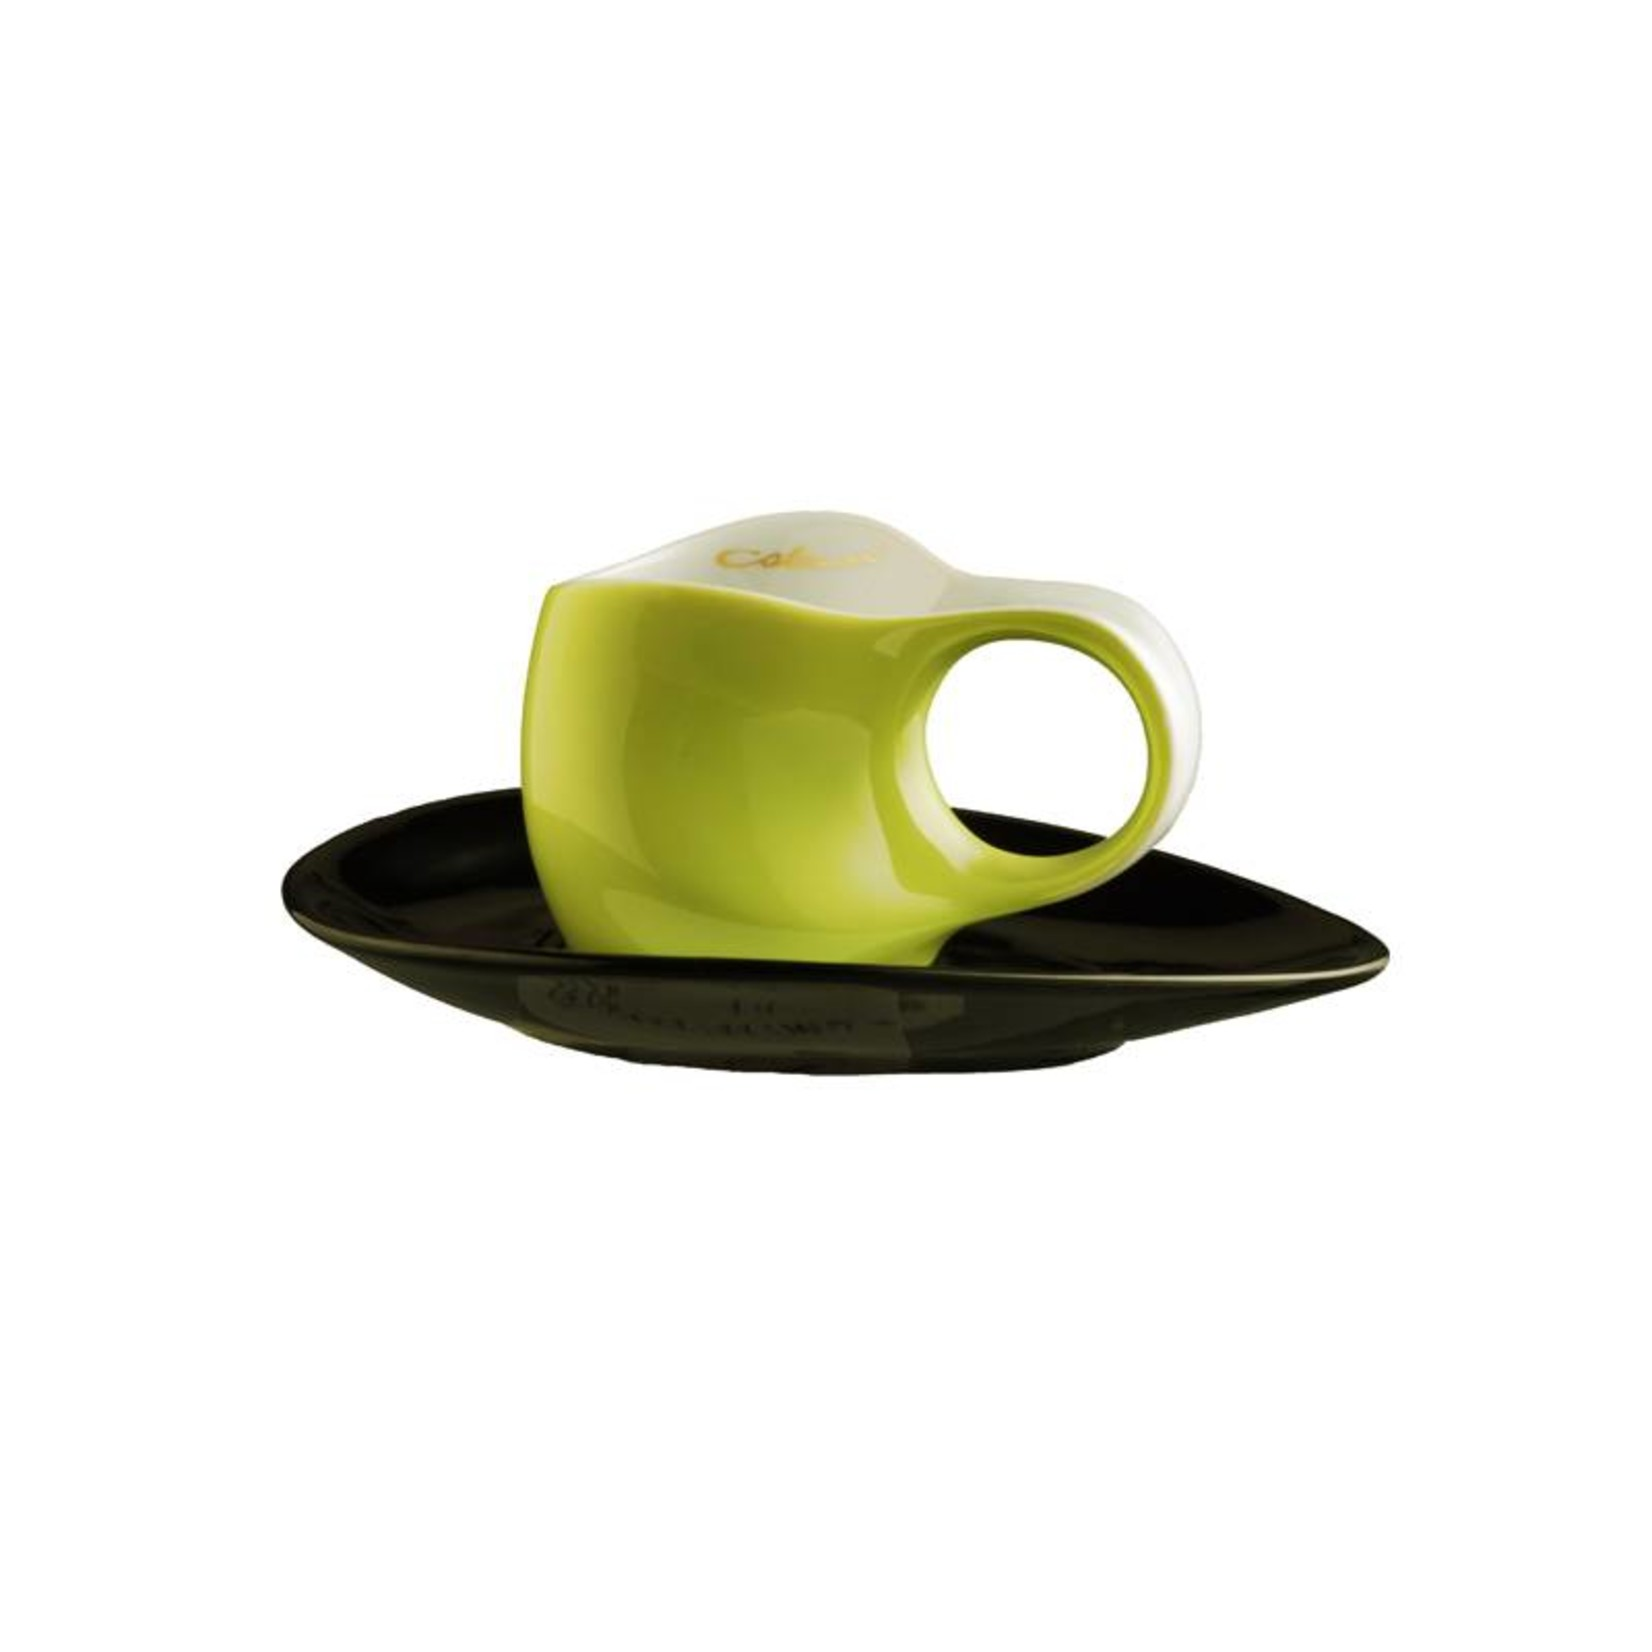 Colani Porzellanserie Colani Espressotasse | Tasse inkl. Unterteller | grün